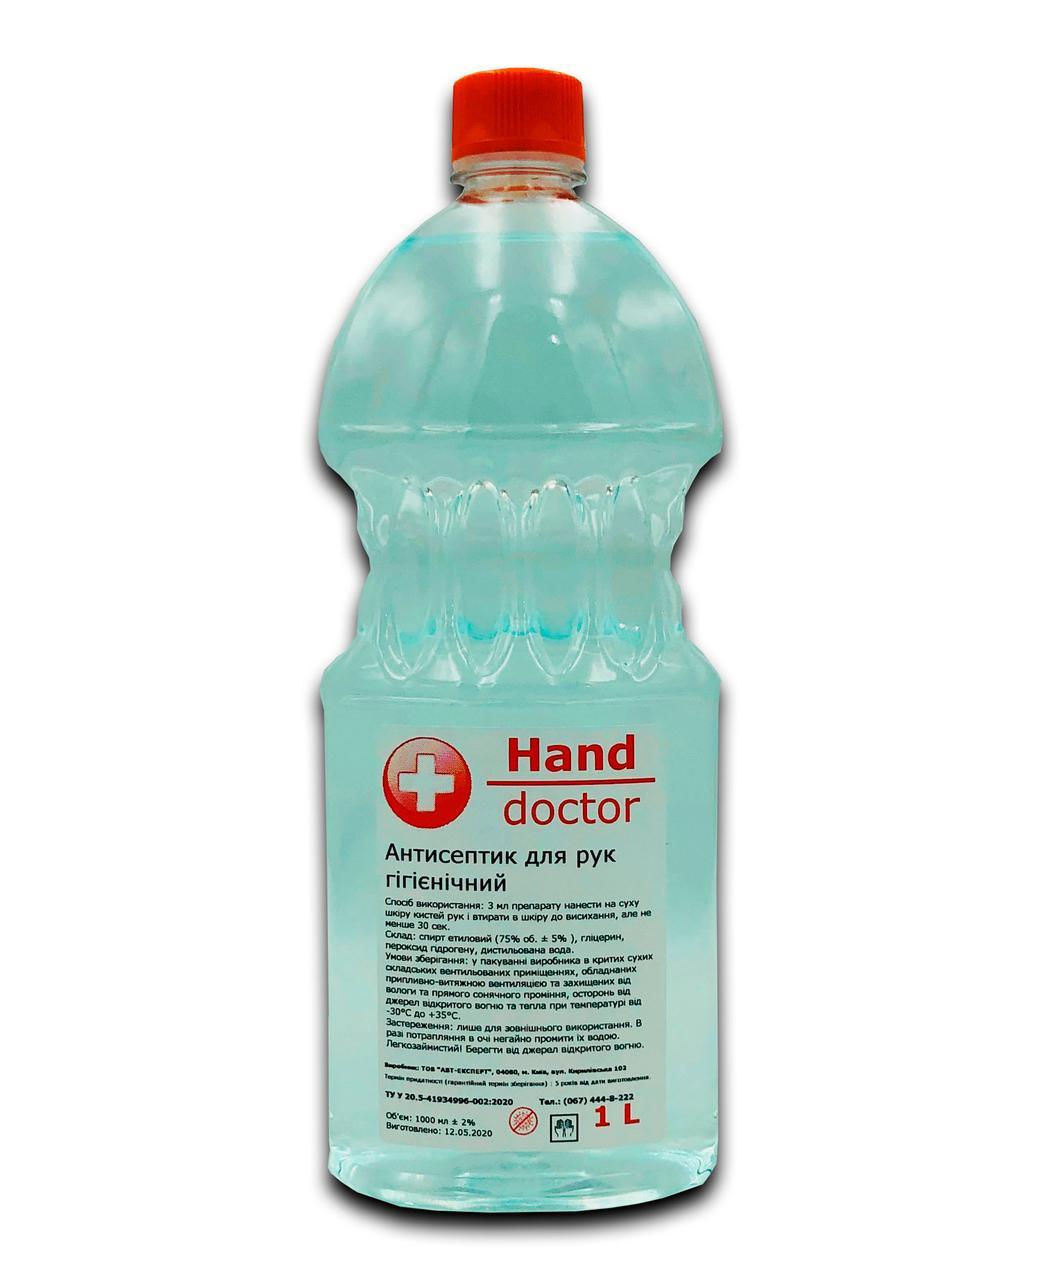 Антисептик спиртової для рук 75% спирту Hand Doctor 1 л